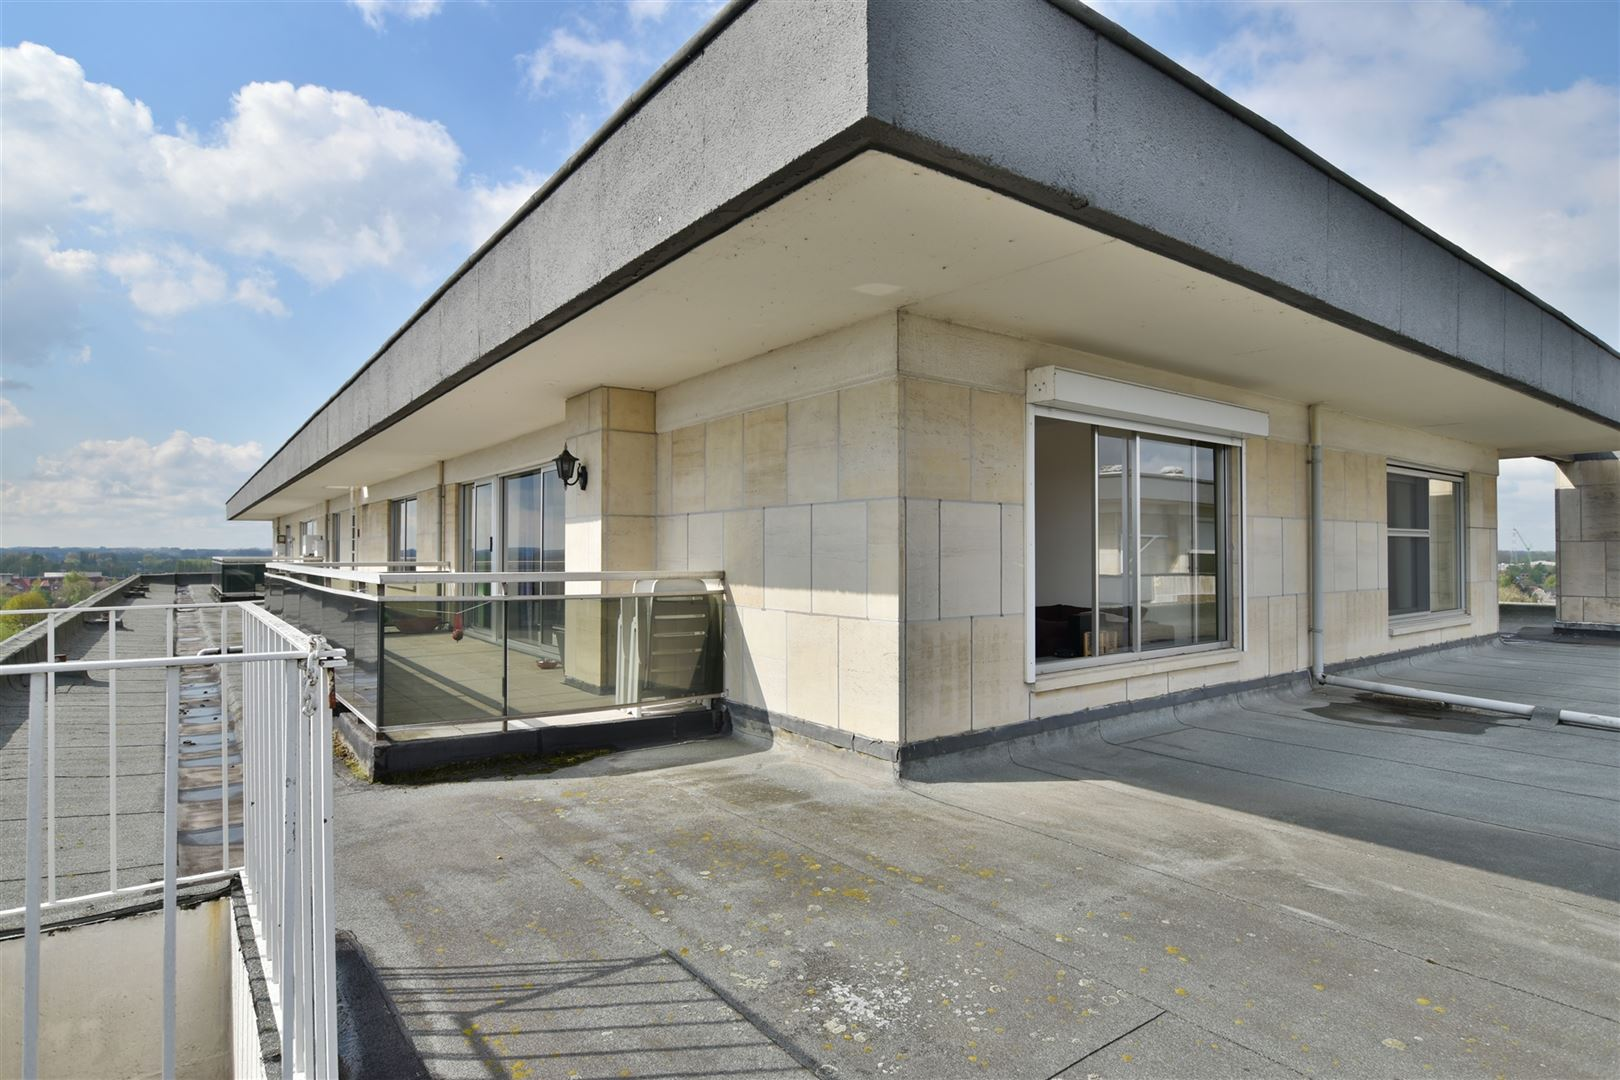 Foto 8 : Appartement te 9200 DENDERMONDE (België) - Prijs € 169.000